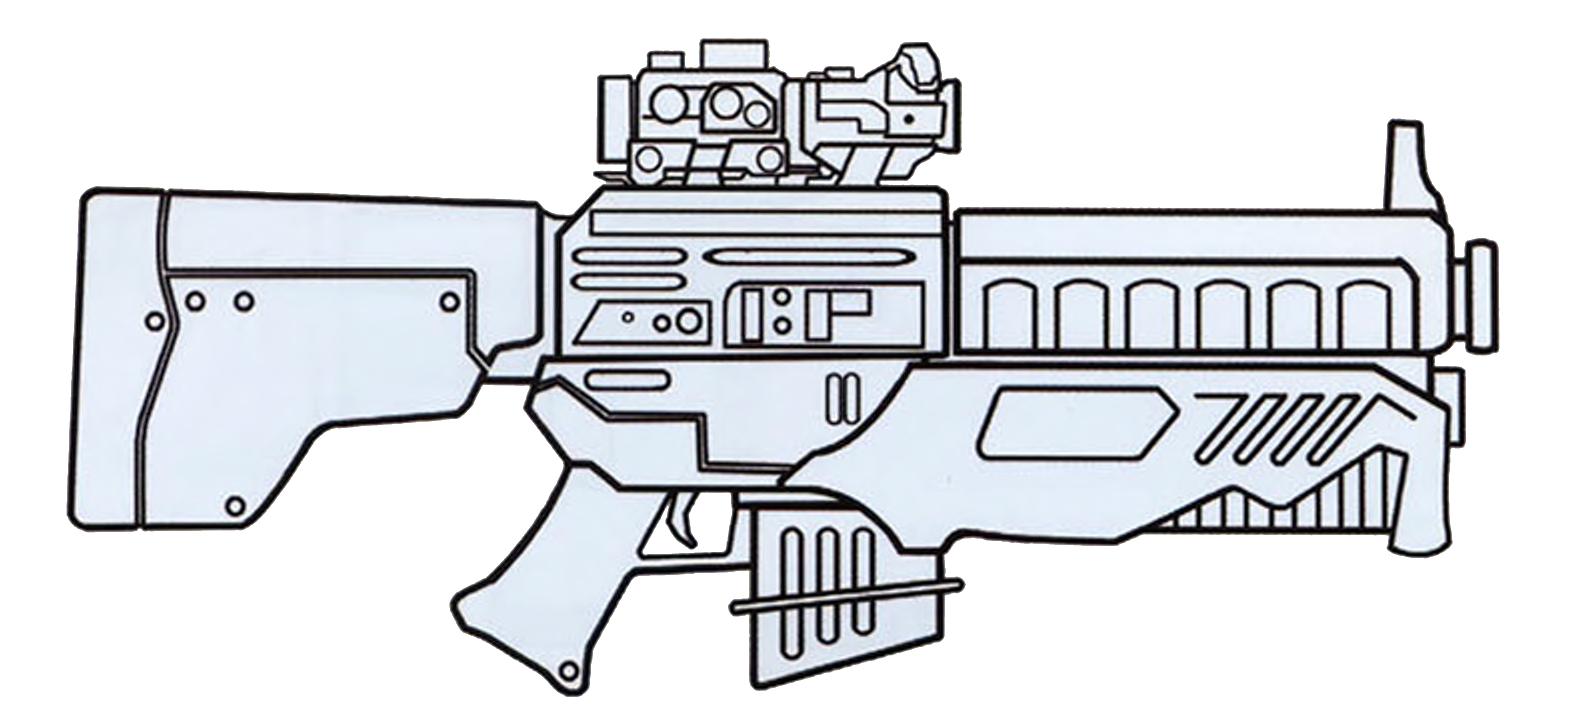 Star wars blaster clipart vector transparent download DH-X heavy blaster rifle | Wookieepedia | FANDOM powered by Wikia vector transparent download